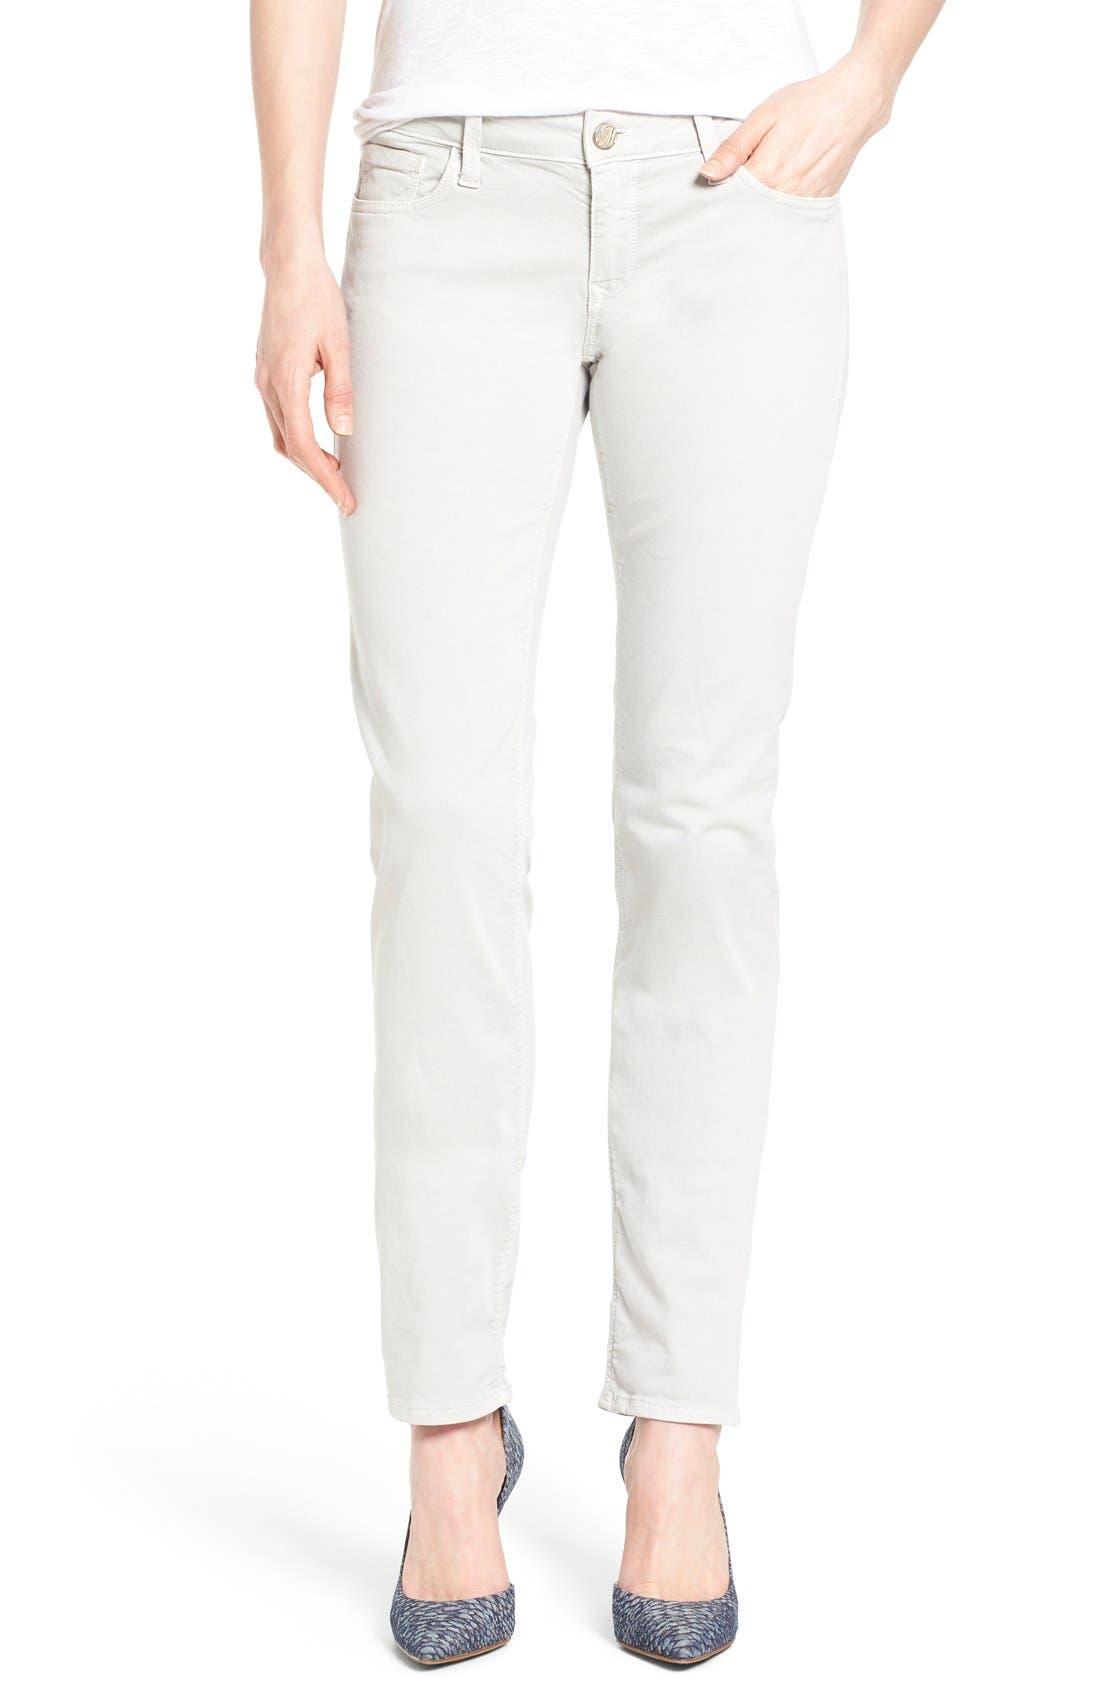 MAVI JEANS 'Emma' Stretch Twill Slim Boyfriend Jeans